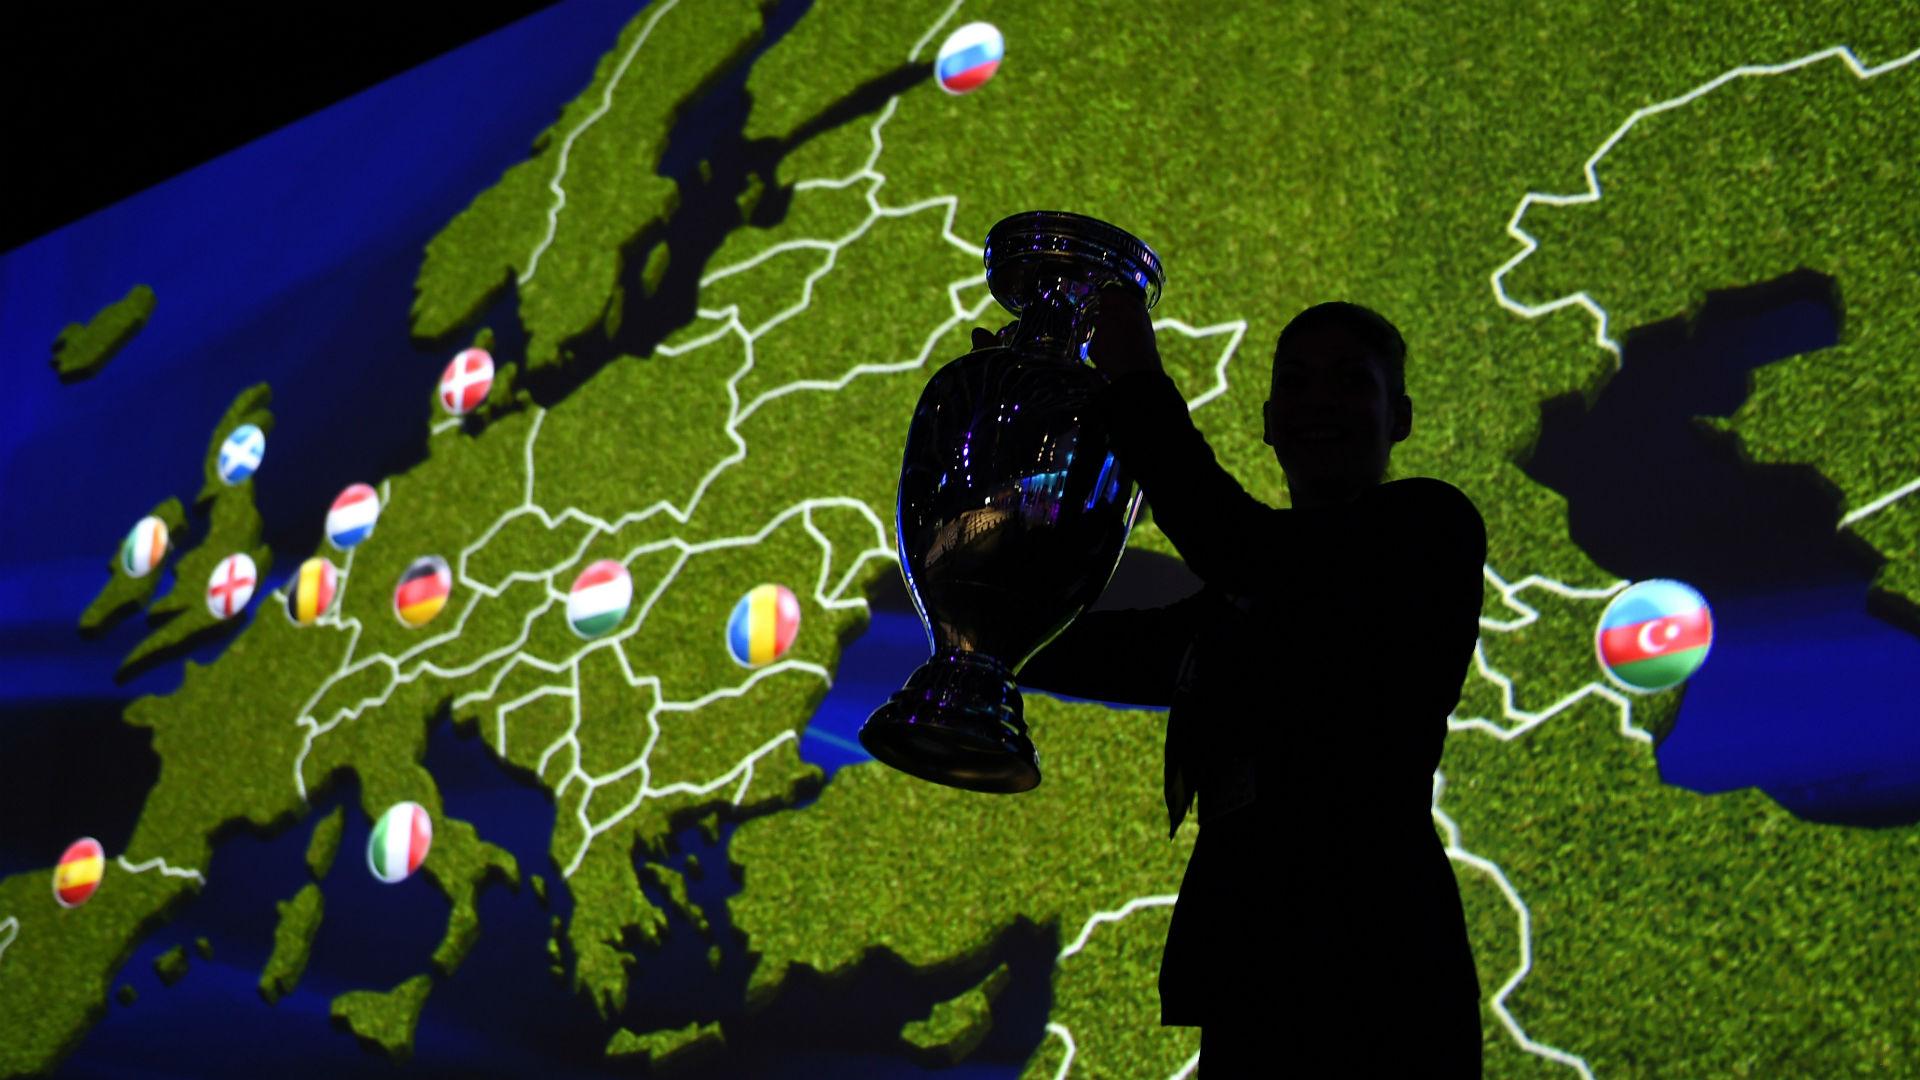 Euro 2020 hosts